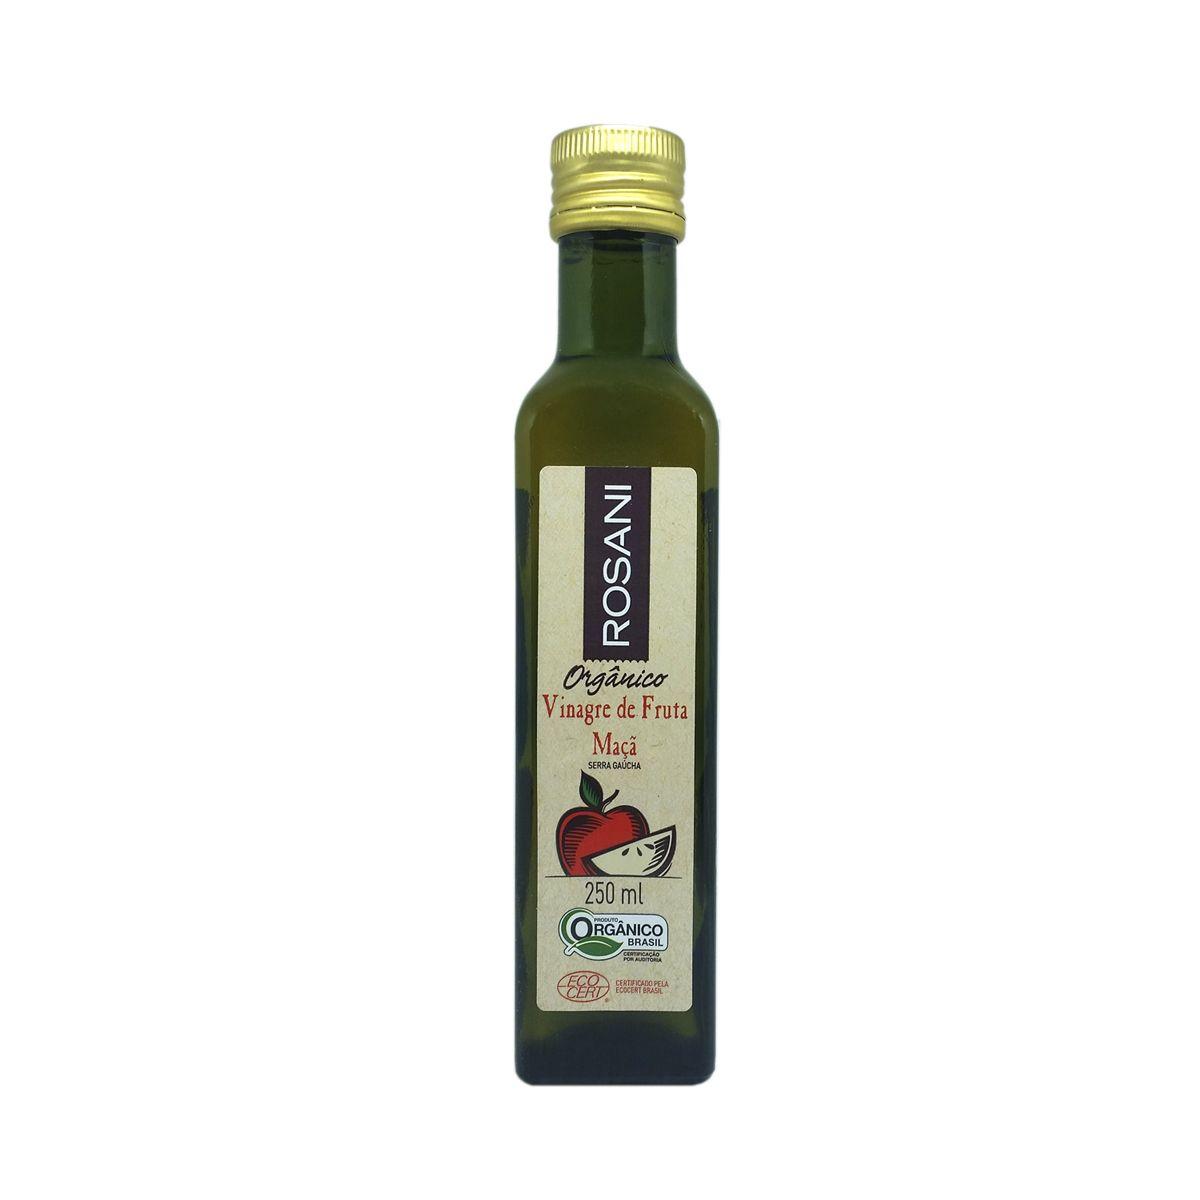 Vinagre de Fruta Maçã Orgânico 250ml ROSANI